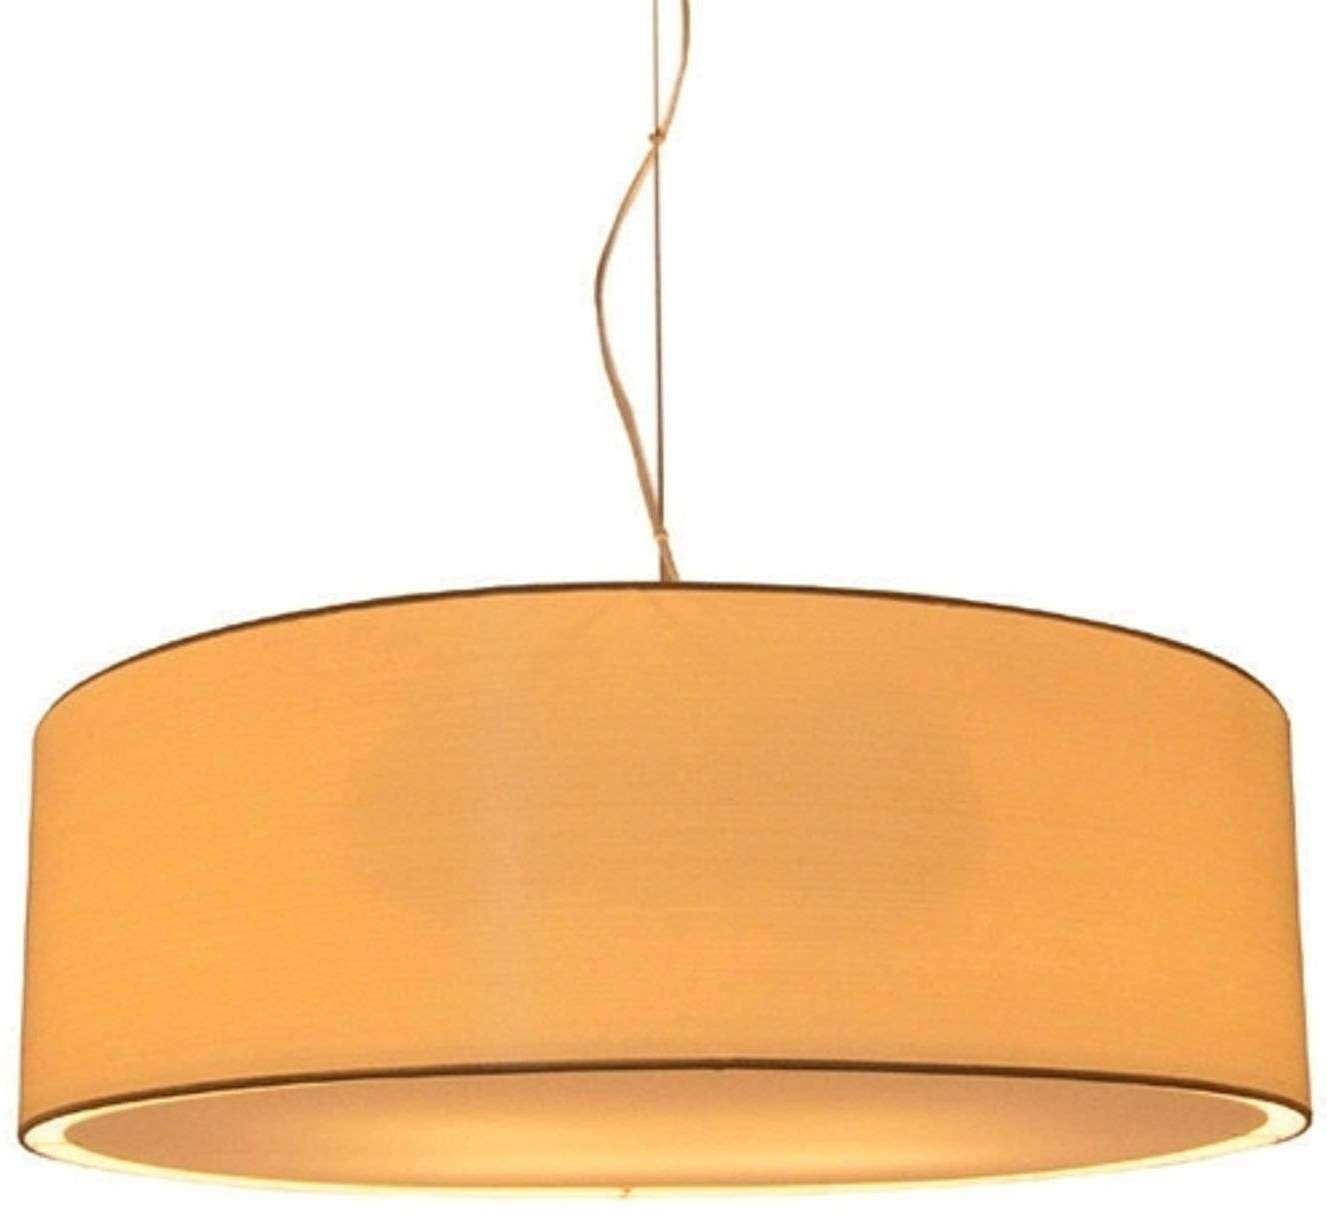 LIVING ELEGANT D 80 cm hanging light  cream